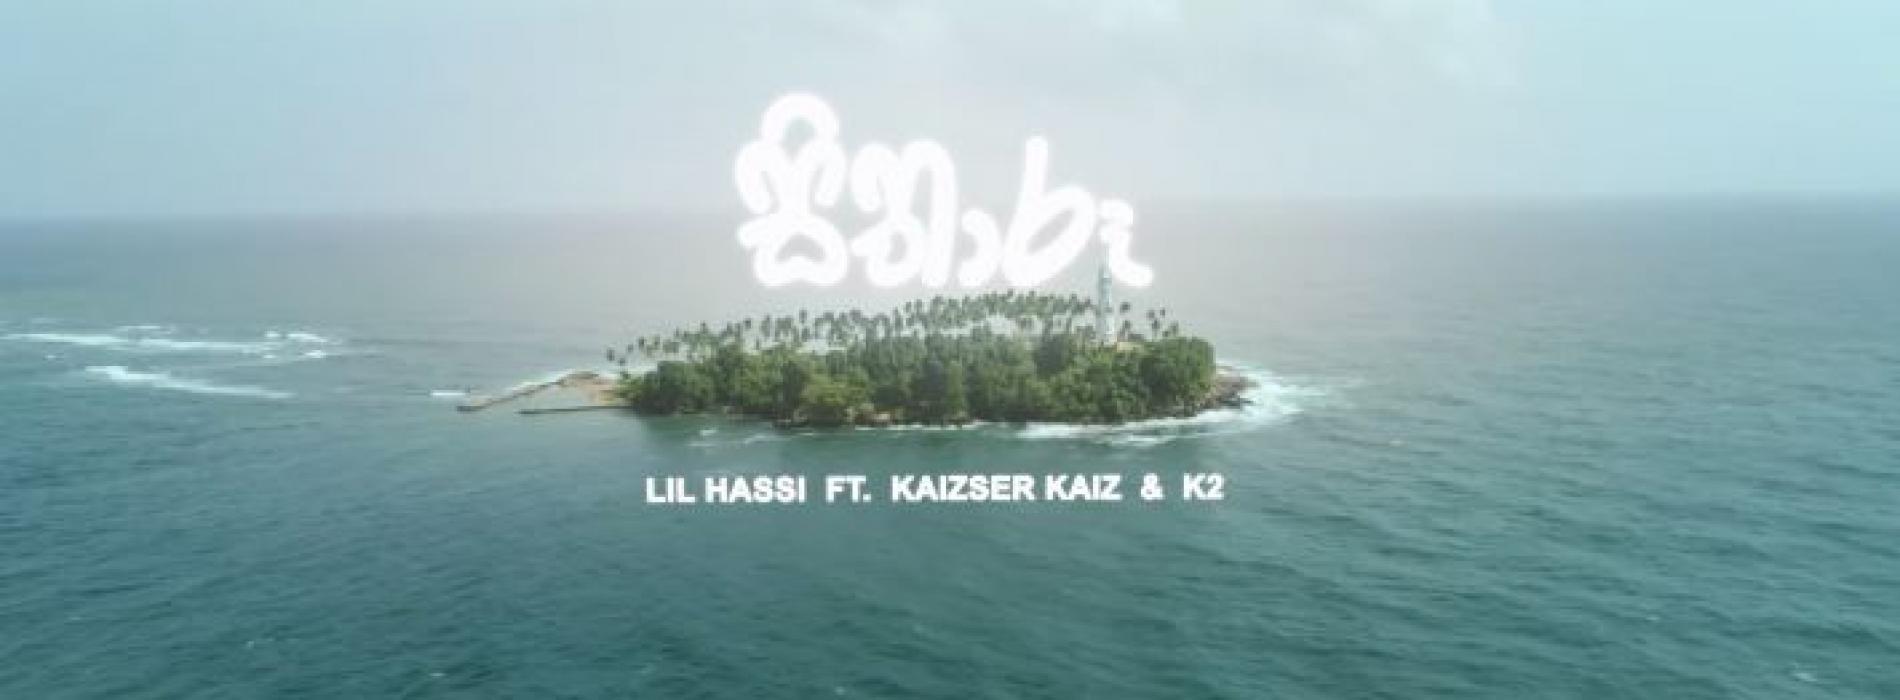 Sitharuu (සිතාරූ) Lil Hassi ft Kaizer kaiz & K2